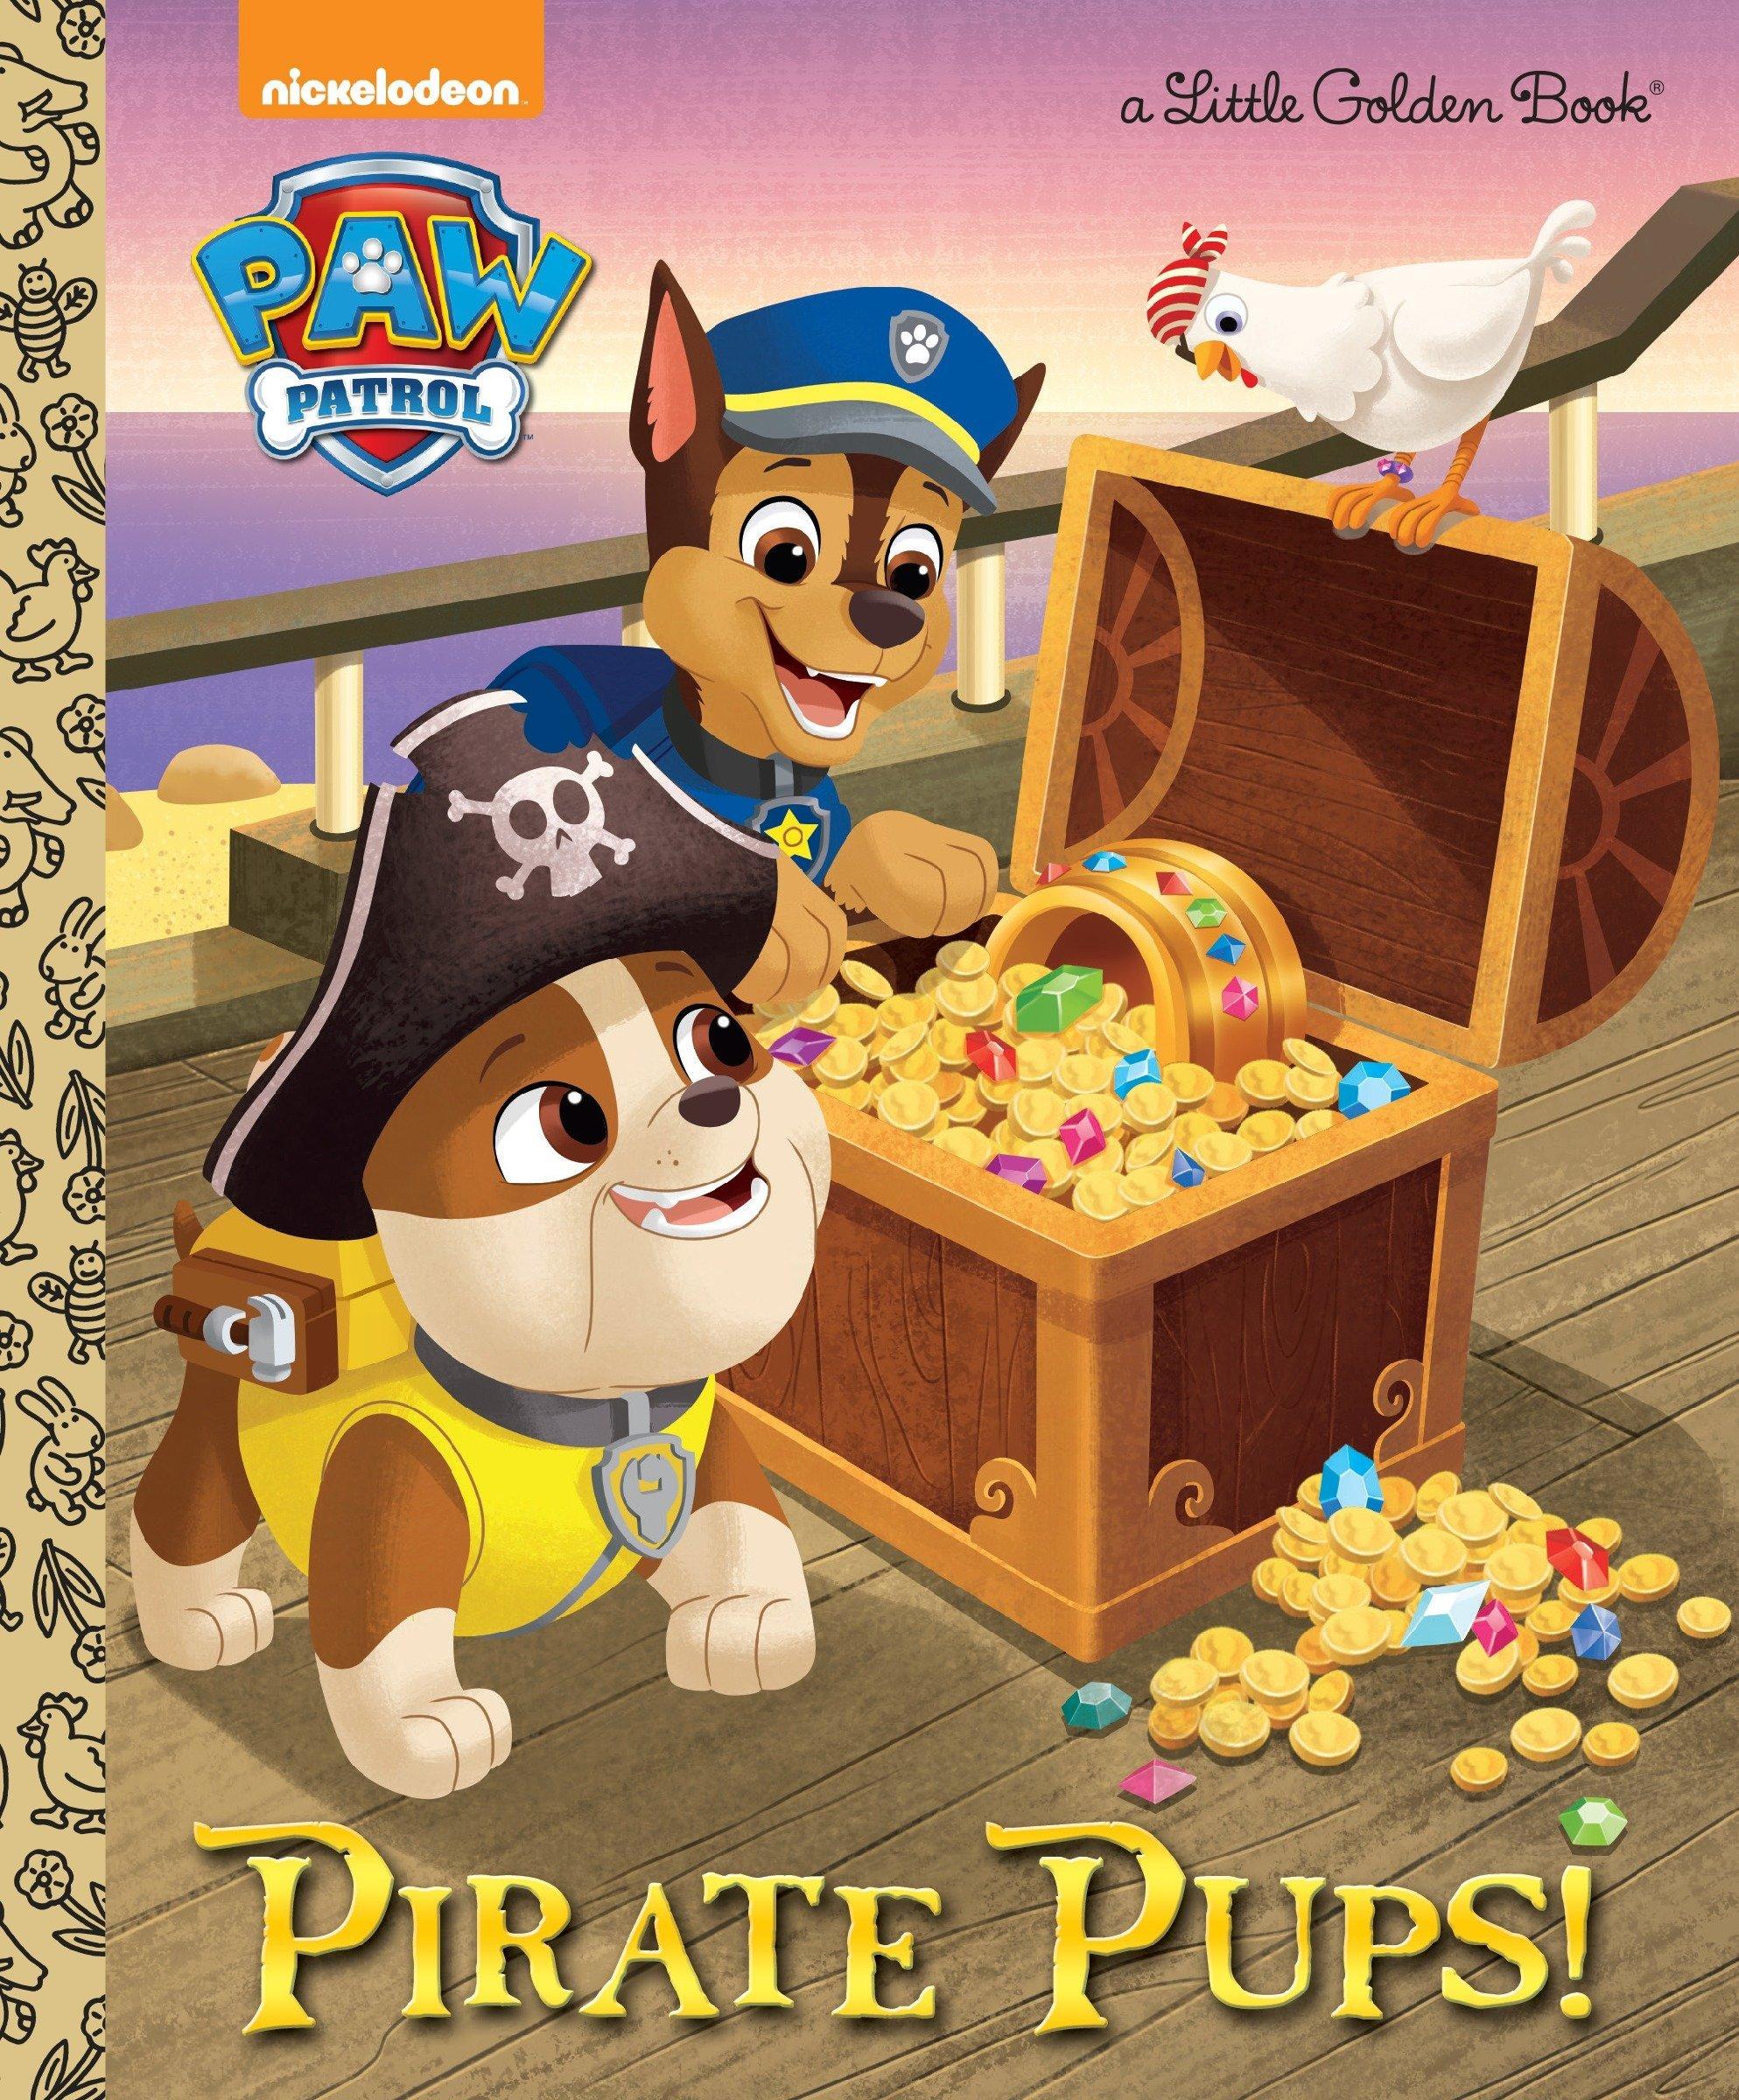 Download Pirate Pups! (Paw Patrol) (Little Golden Book) ebook